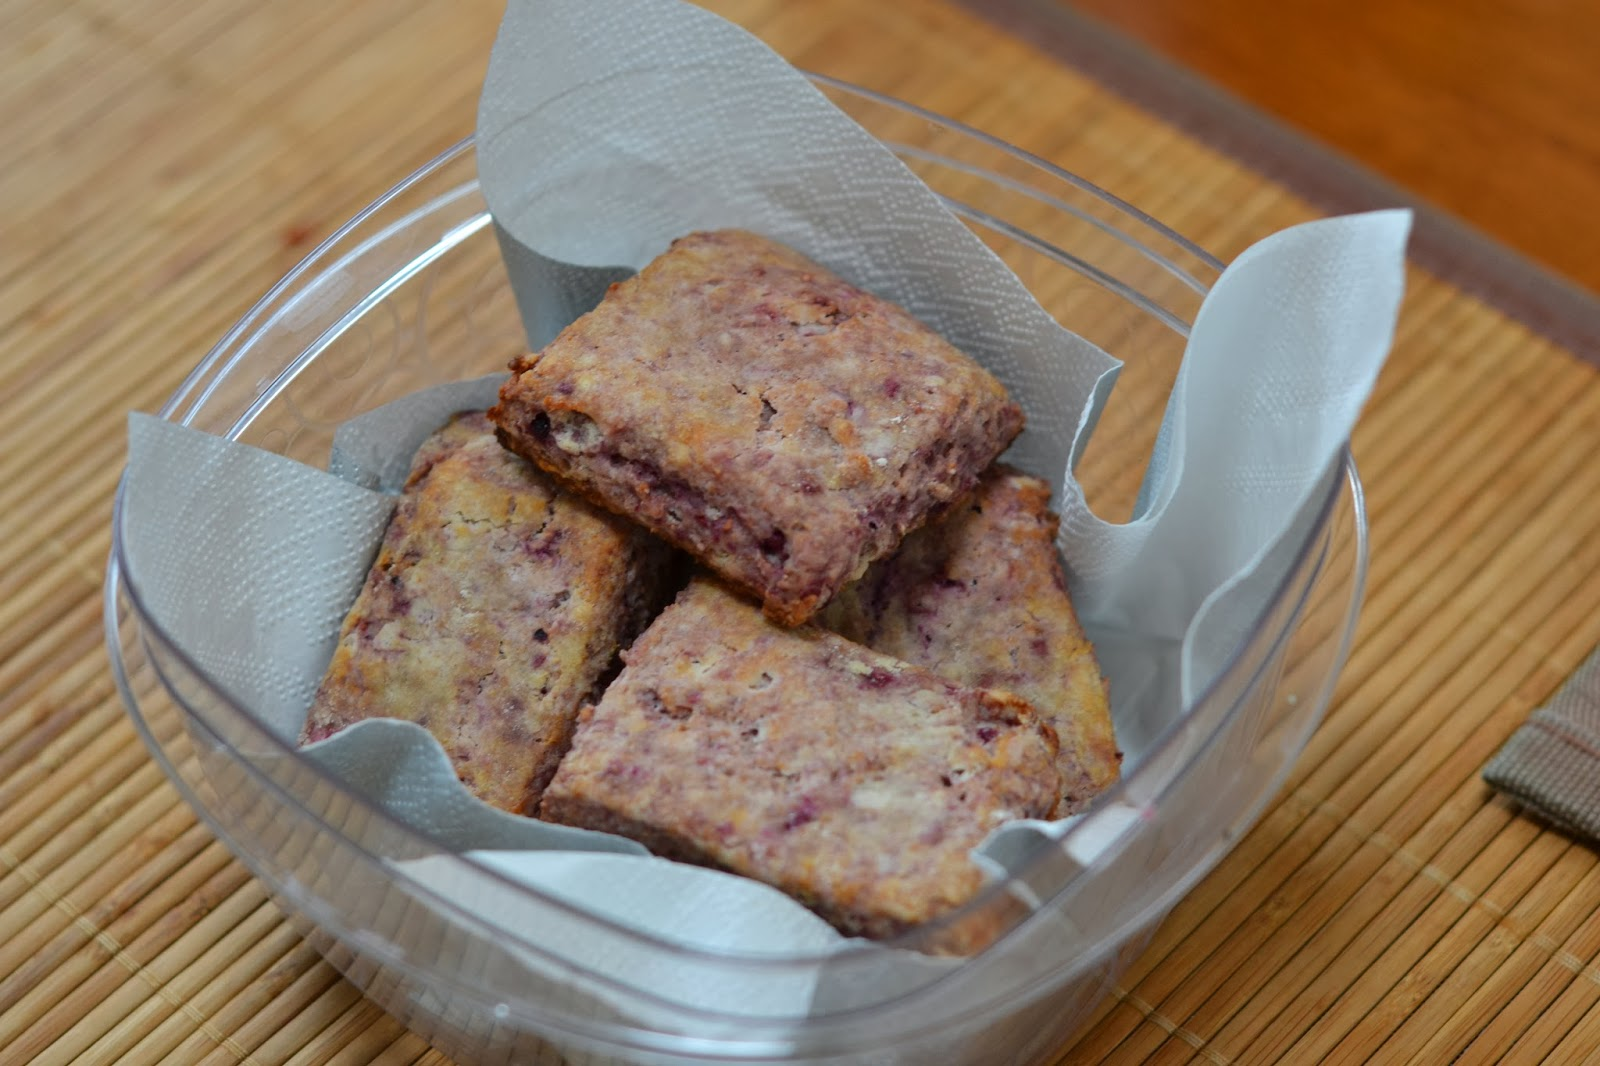 The Eibls Smitten Kitchen S Whole Wheat Raspberry Ricotta Scones